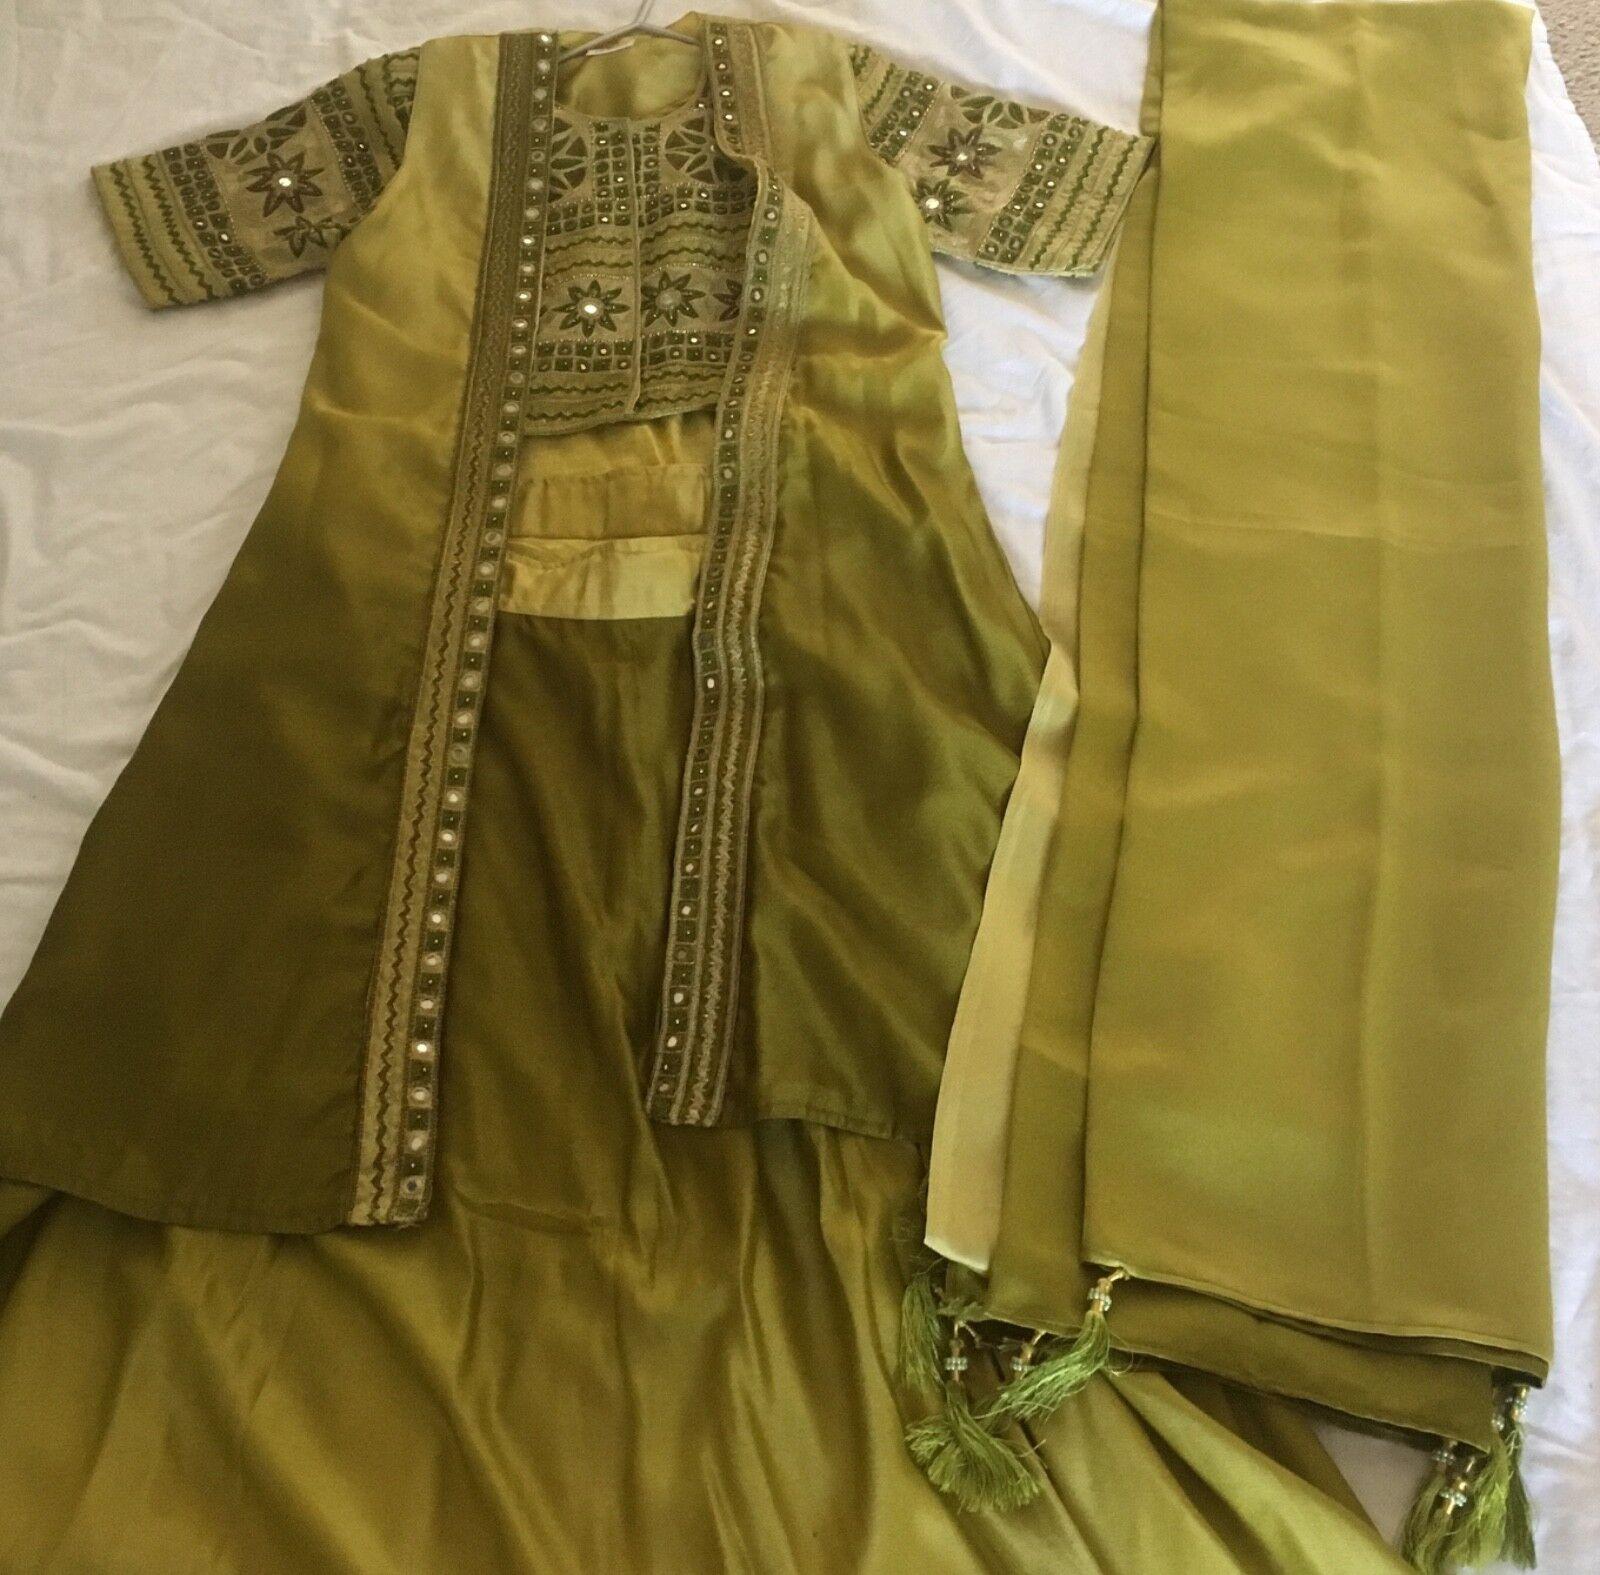 Indian/Pakistani 4 piece beautiful green lengha 12-14, may fit size 16